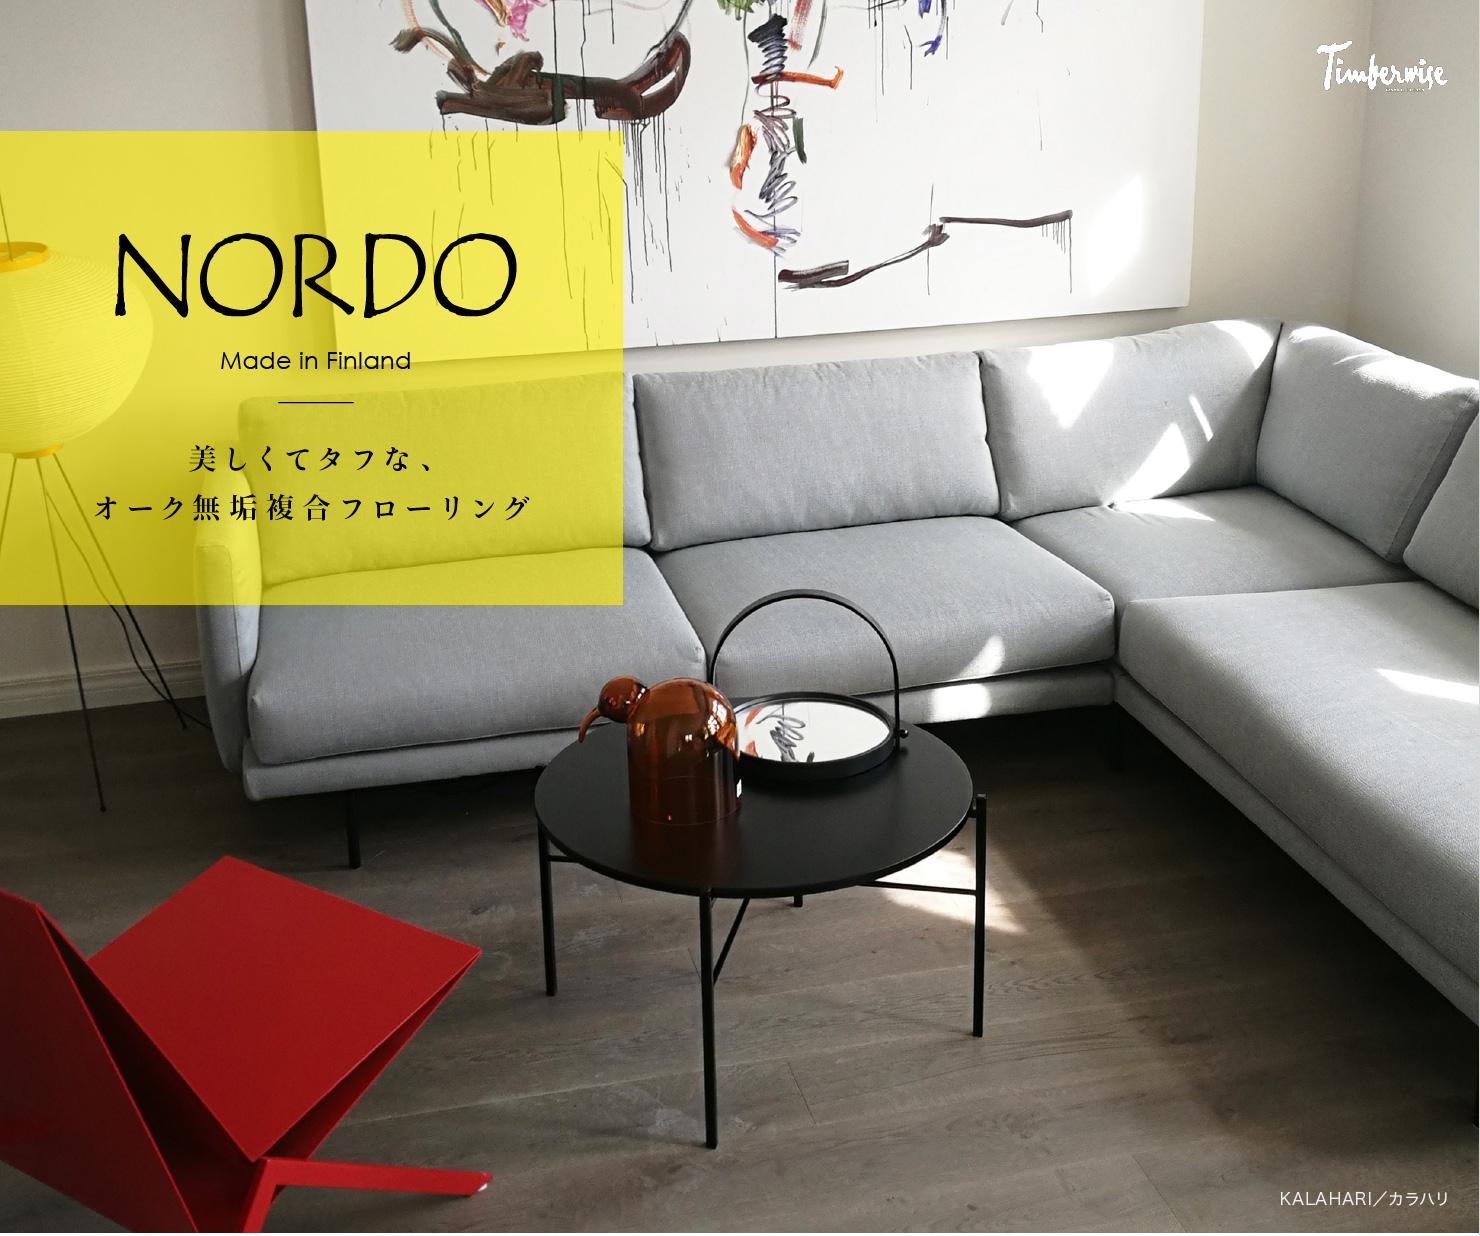 NORD ノルド Made in Finland 美しくてタフな、オーク無垢複合フローリング